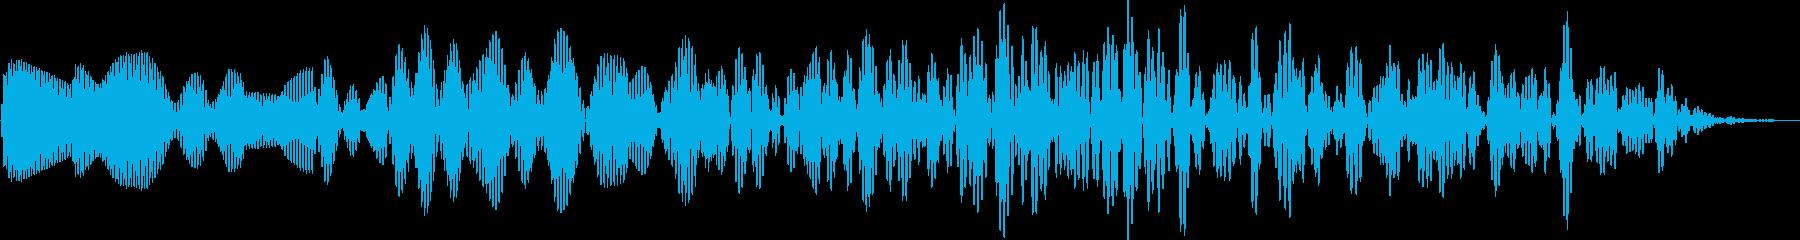 AMGアナログFX42の再生済みの波形